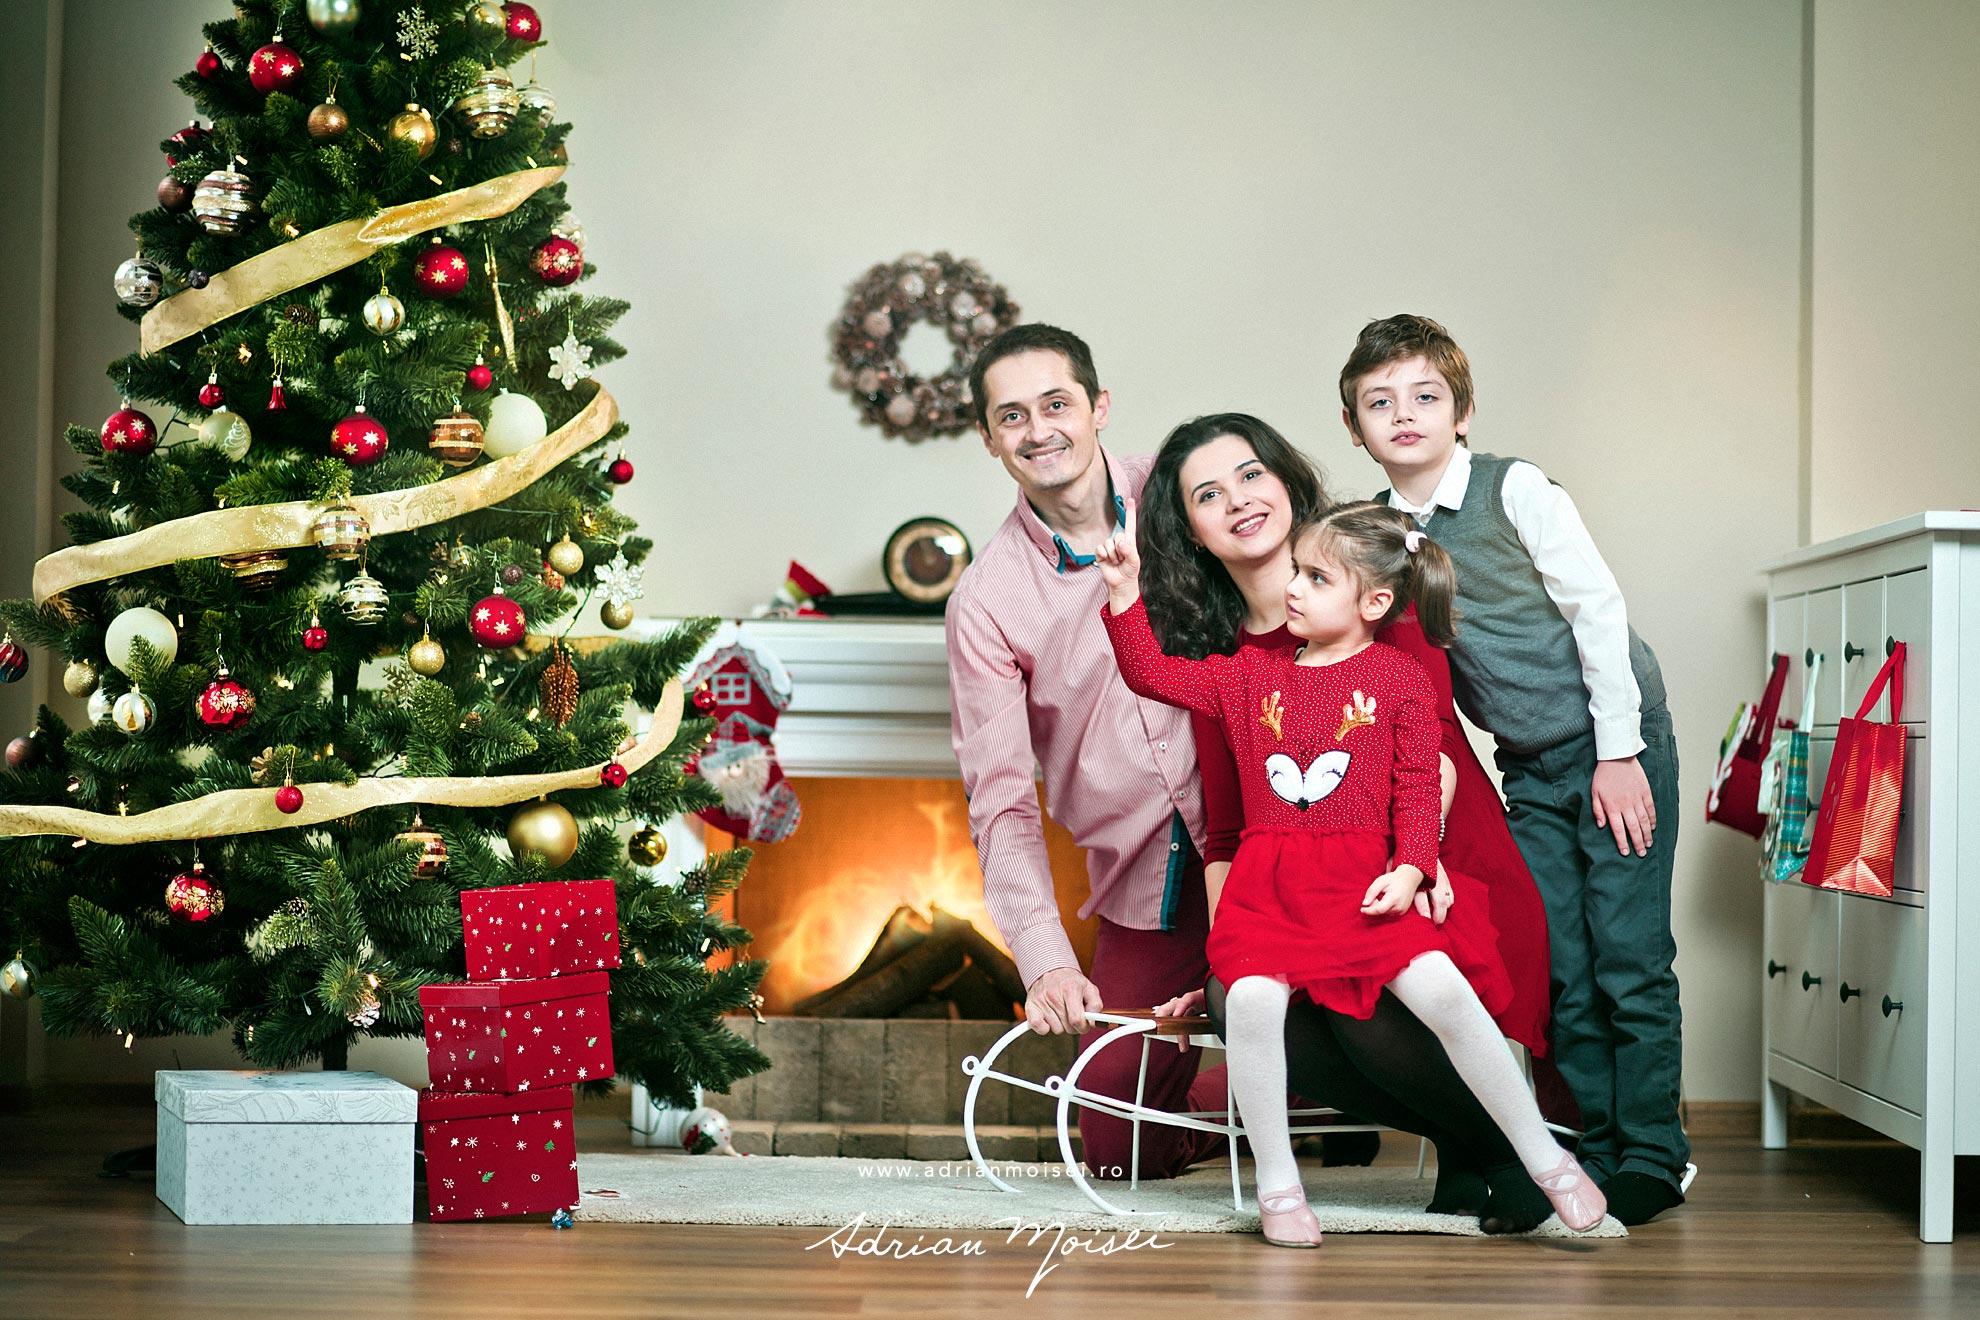 Fotograf familie Iasi, Sesiune foto craciun iasi. Sedinta foto de Craciun de Adrian Moisei la studio foto video Iasi